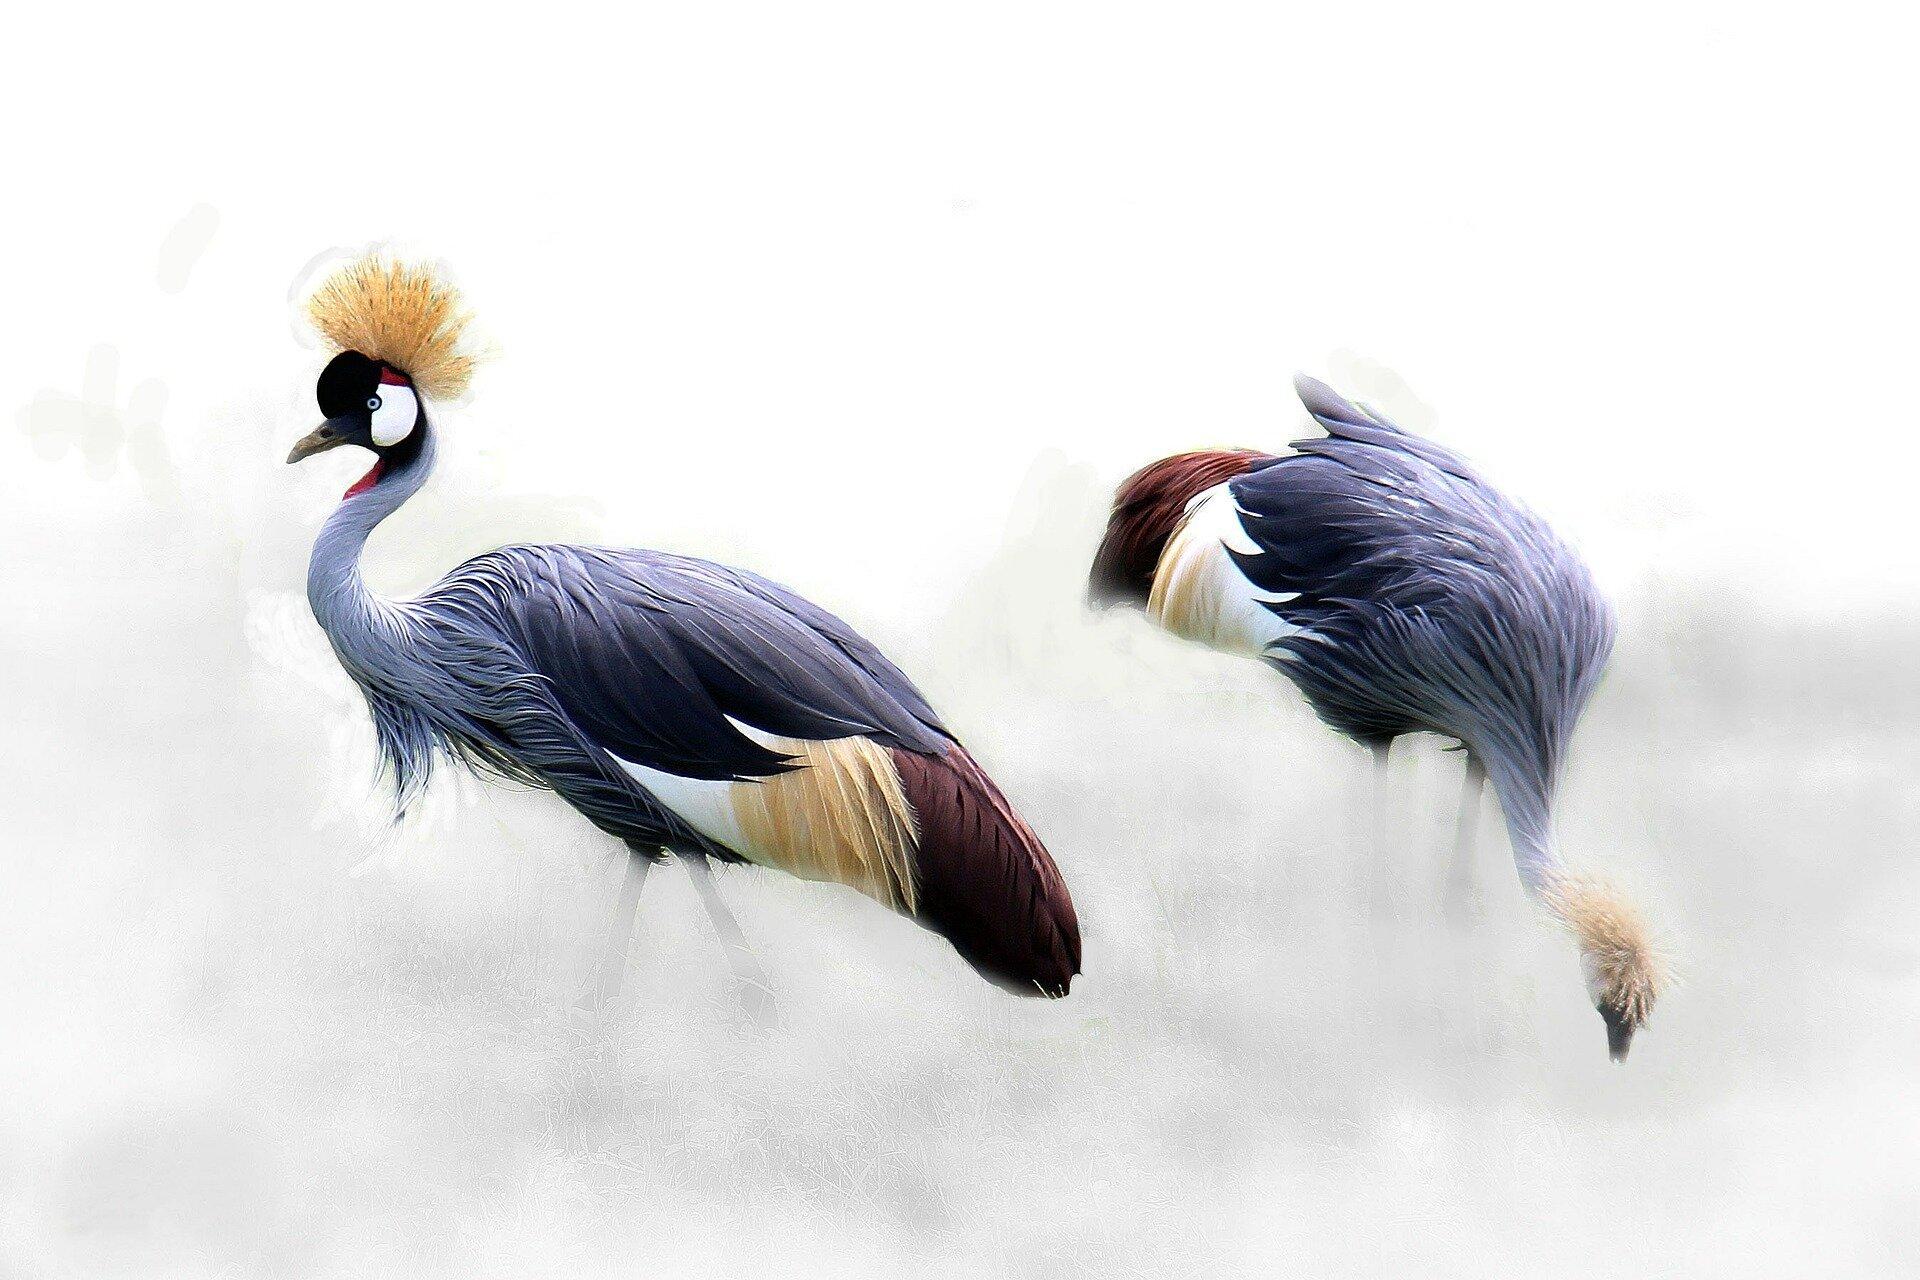 grey-crowned-crane-610463_1920